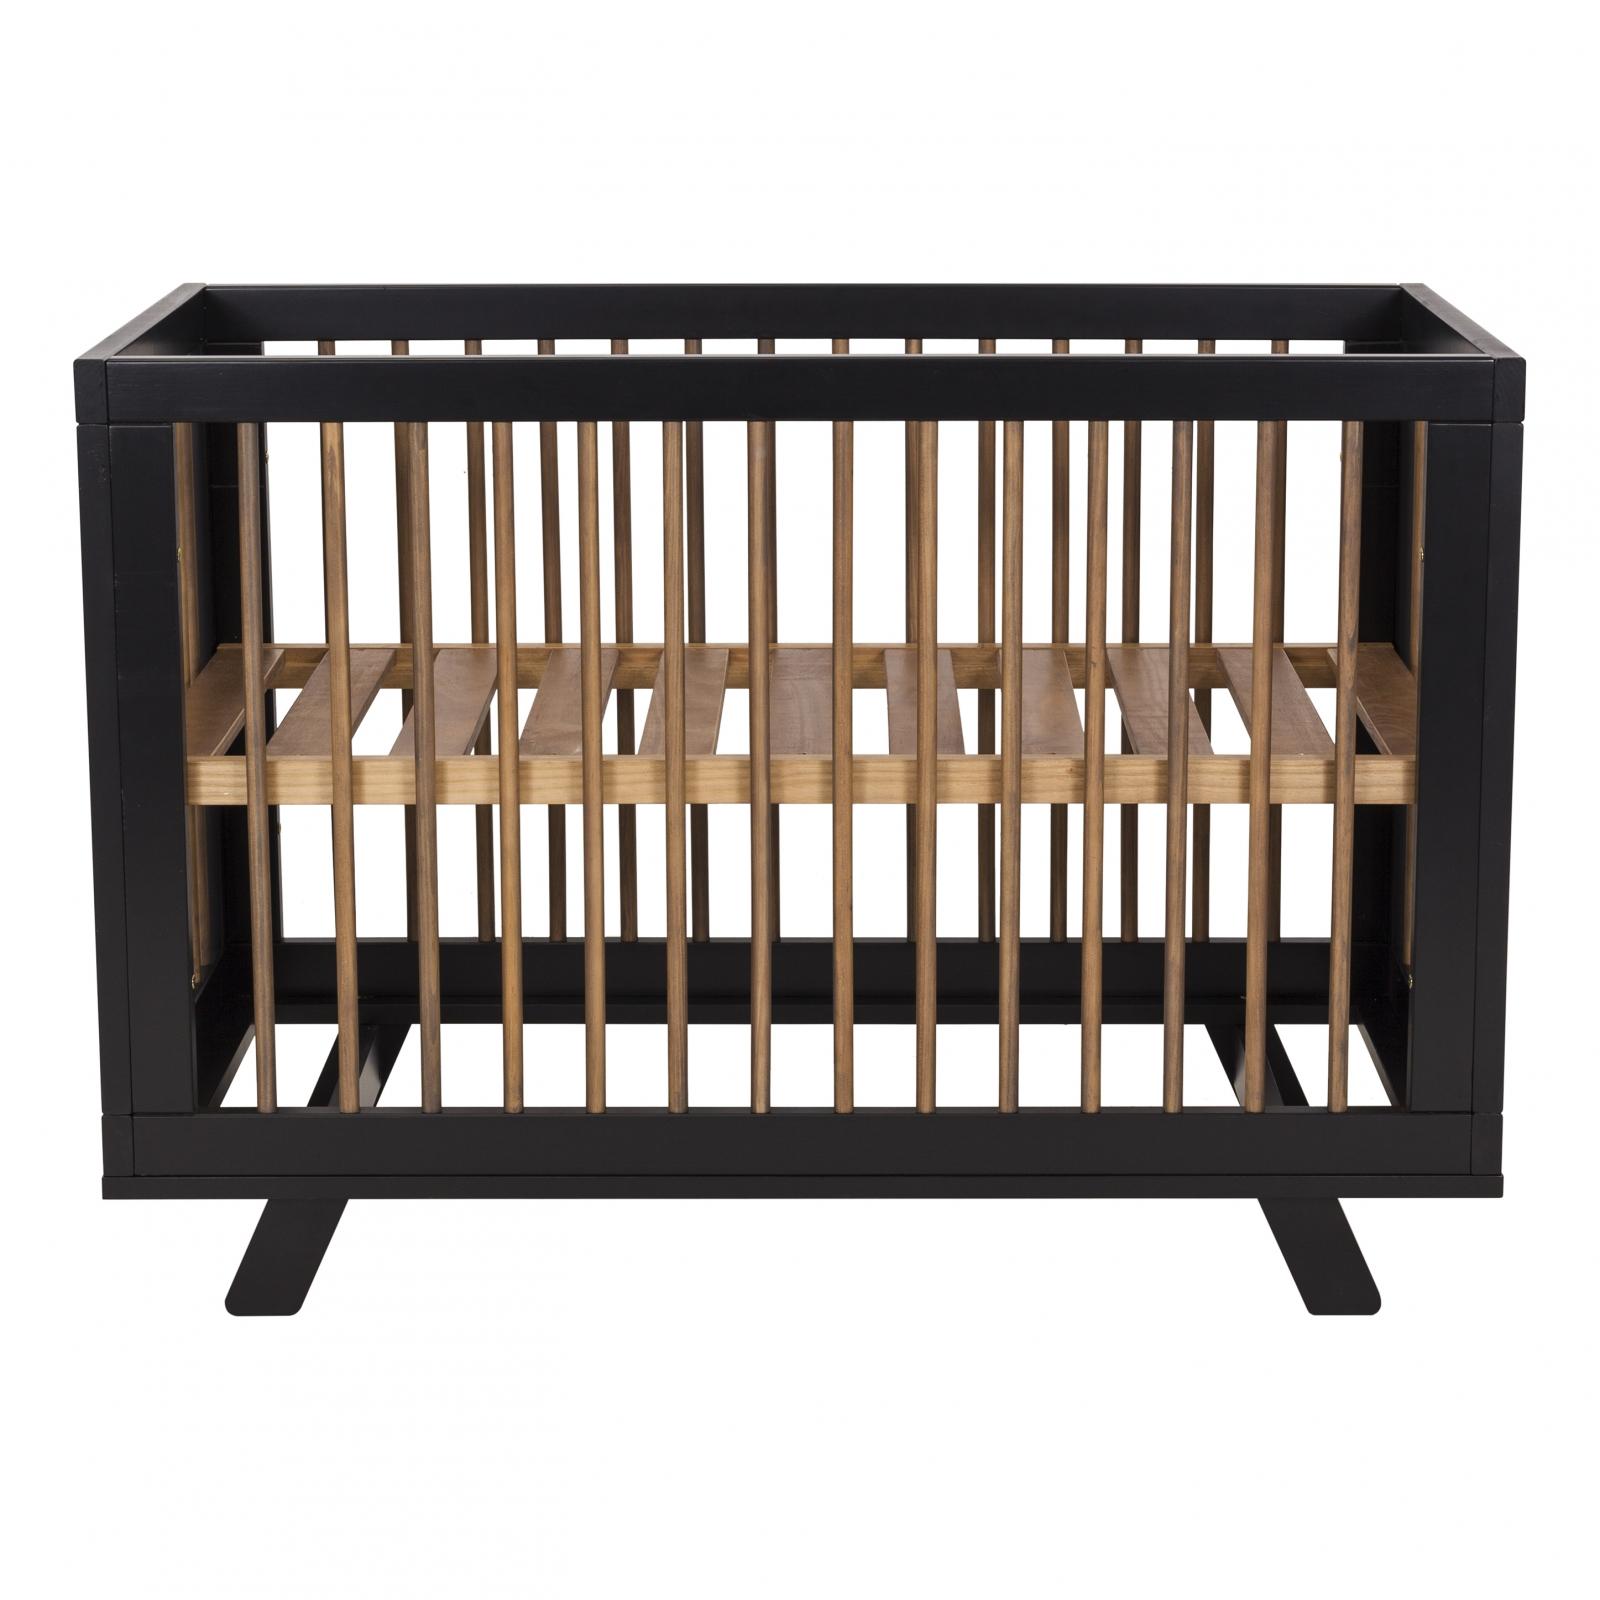 Coming kids Harper Crib 60x120